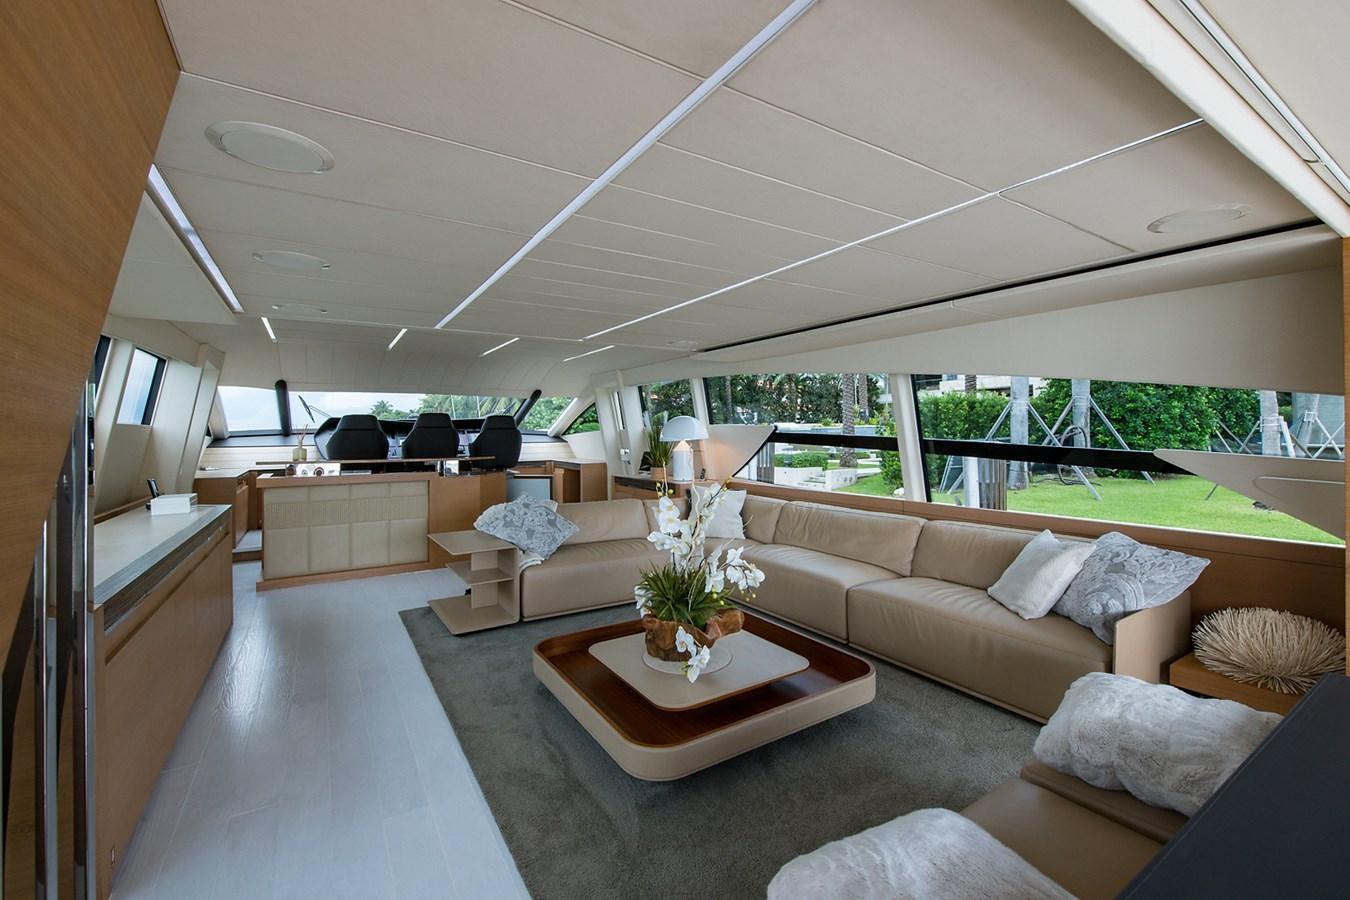 Incognito_Salon6 2012 PERSHING  Motor Yacht 2810381